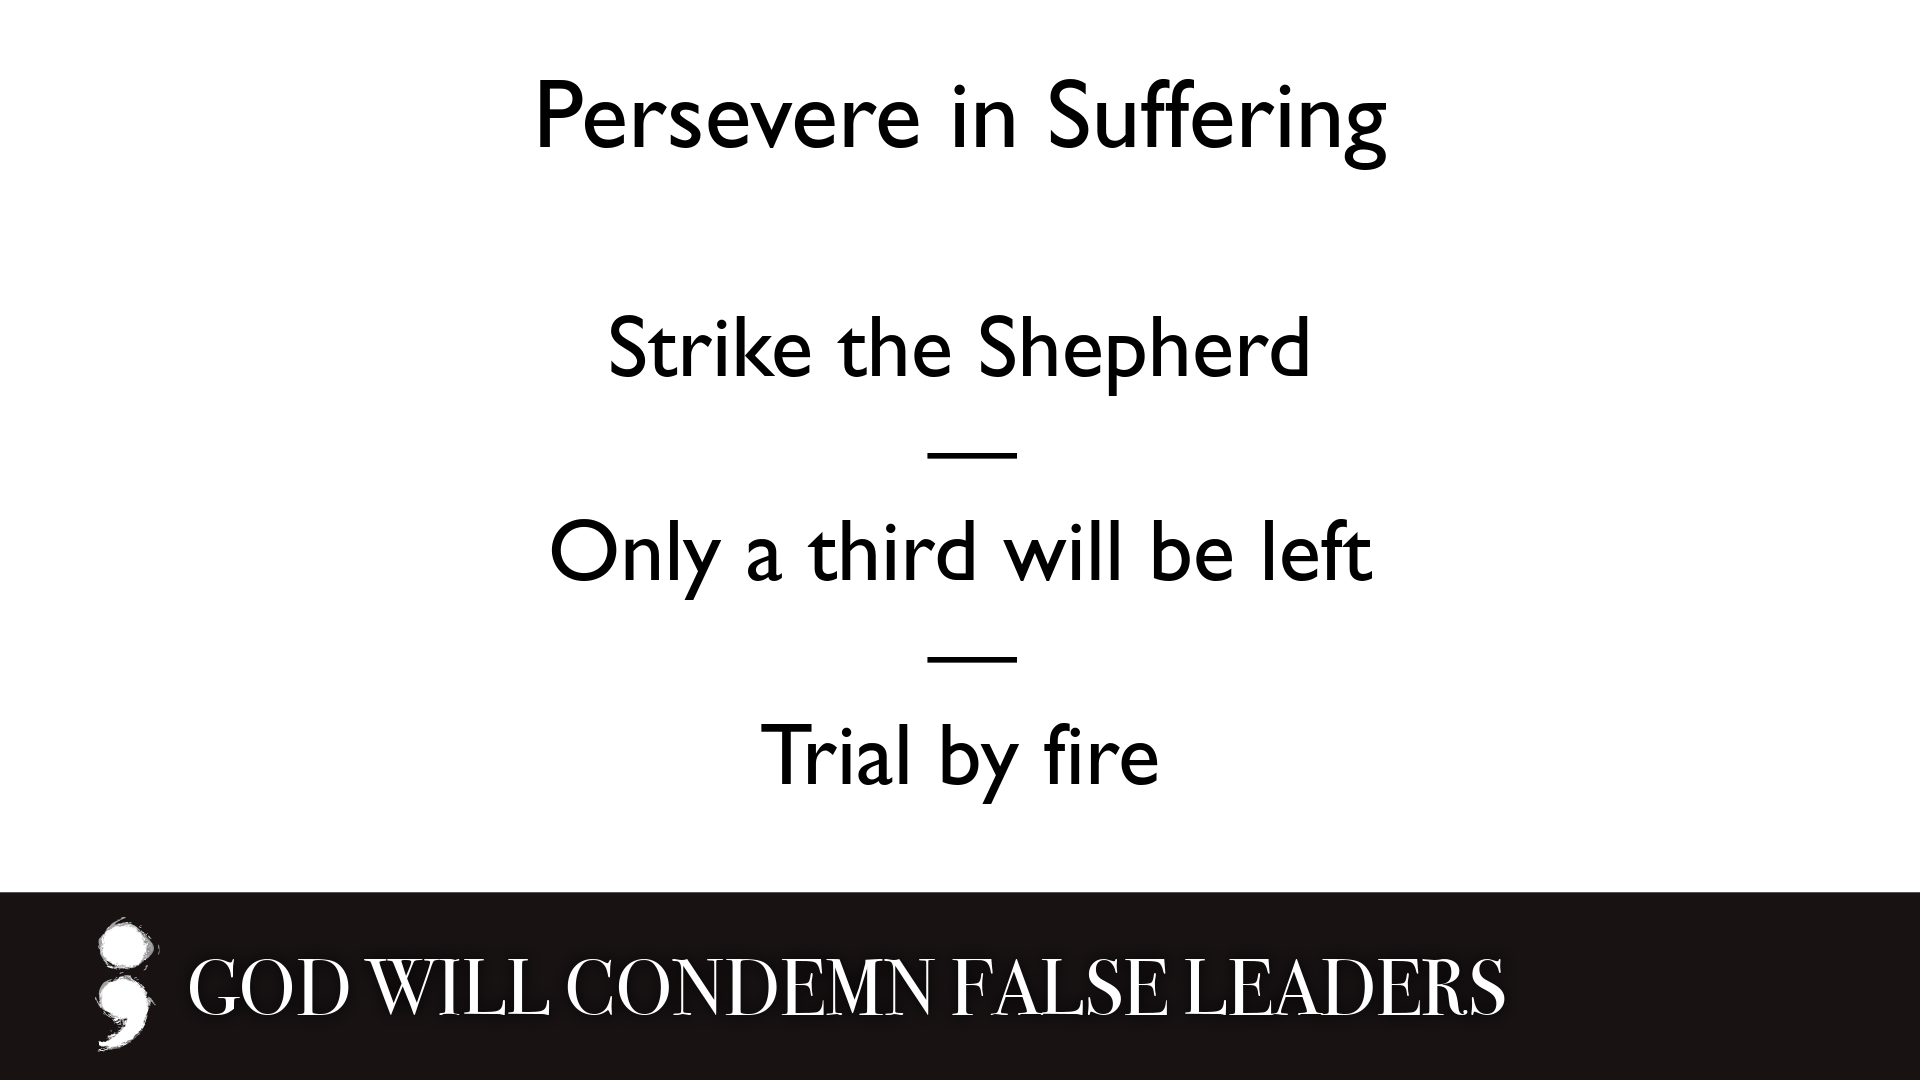 God will condemn false leaders.004.png